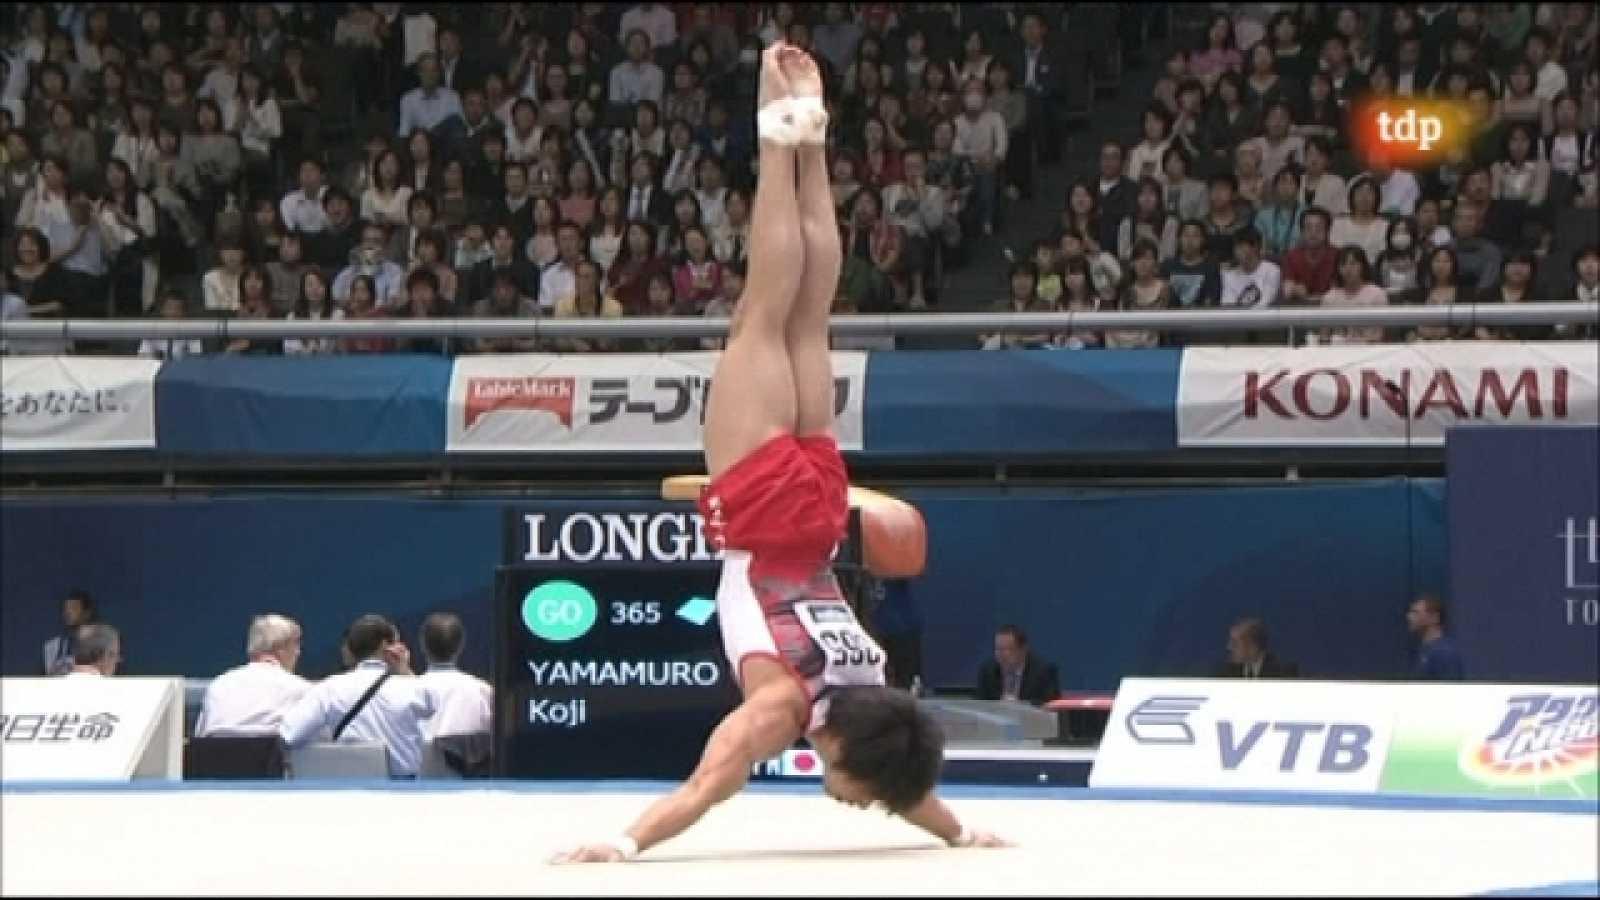 Gimnasia artística - Campeonato del mundo. Concurso completo masculino - Primera parte - 14/10/11 - Ver ahora